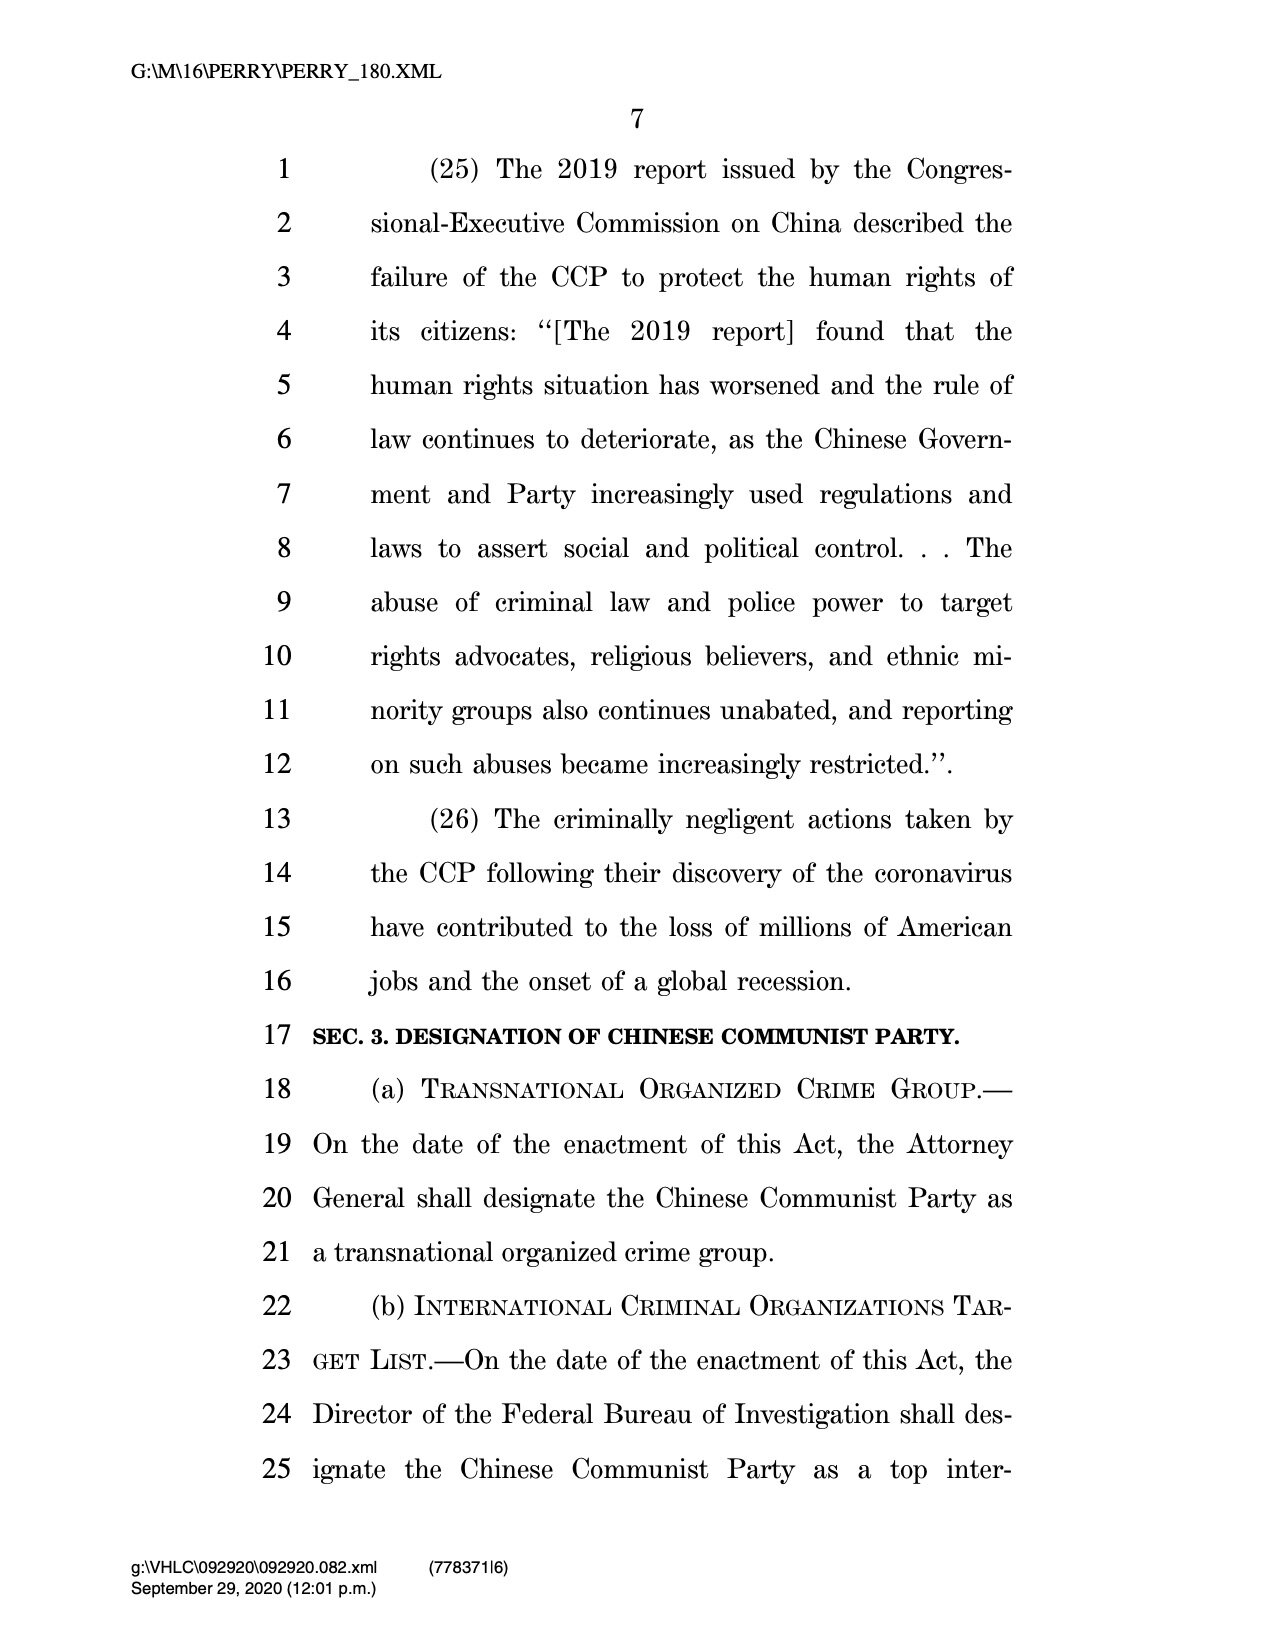 CCP as a TOC Bill - Final Edition7.jpg